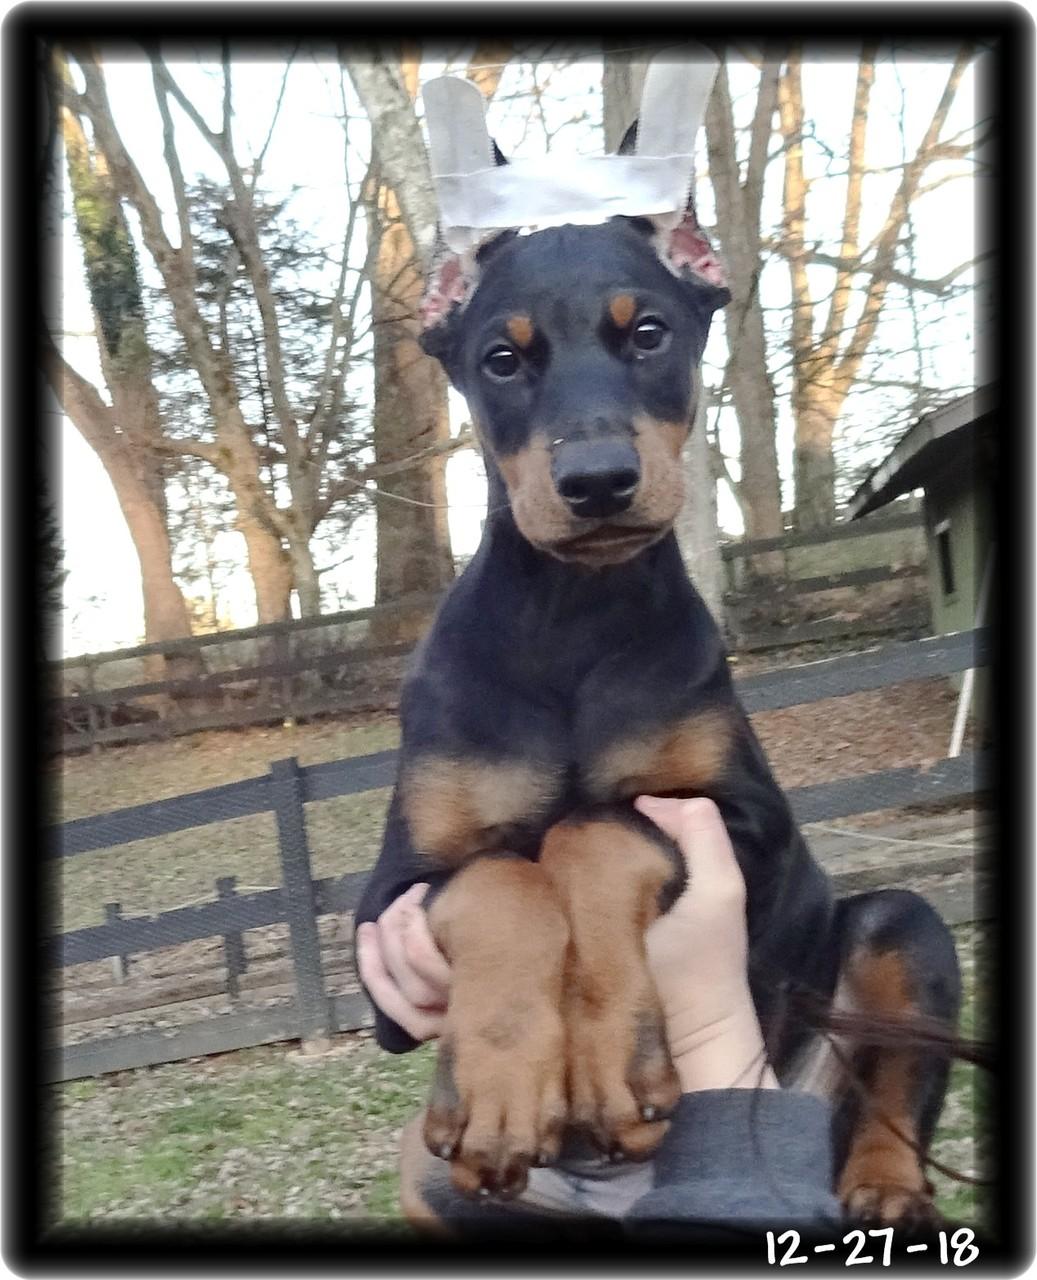 Skona ... Miska & Kodiak pup born 10-20-18... now at home in Kingsport TN